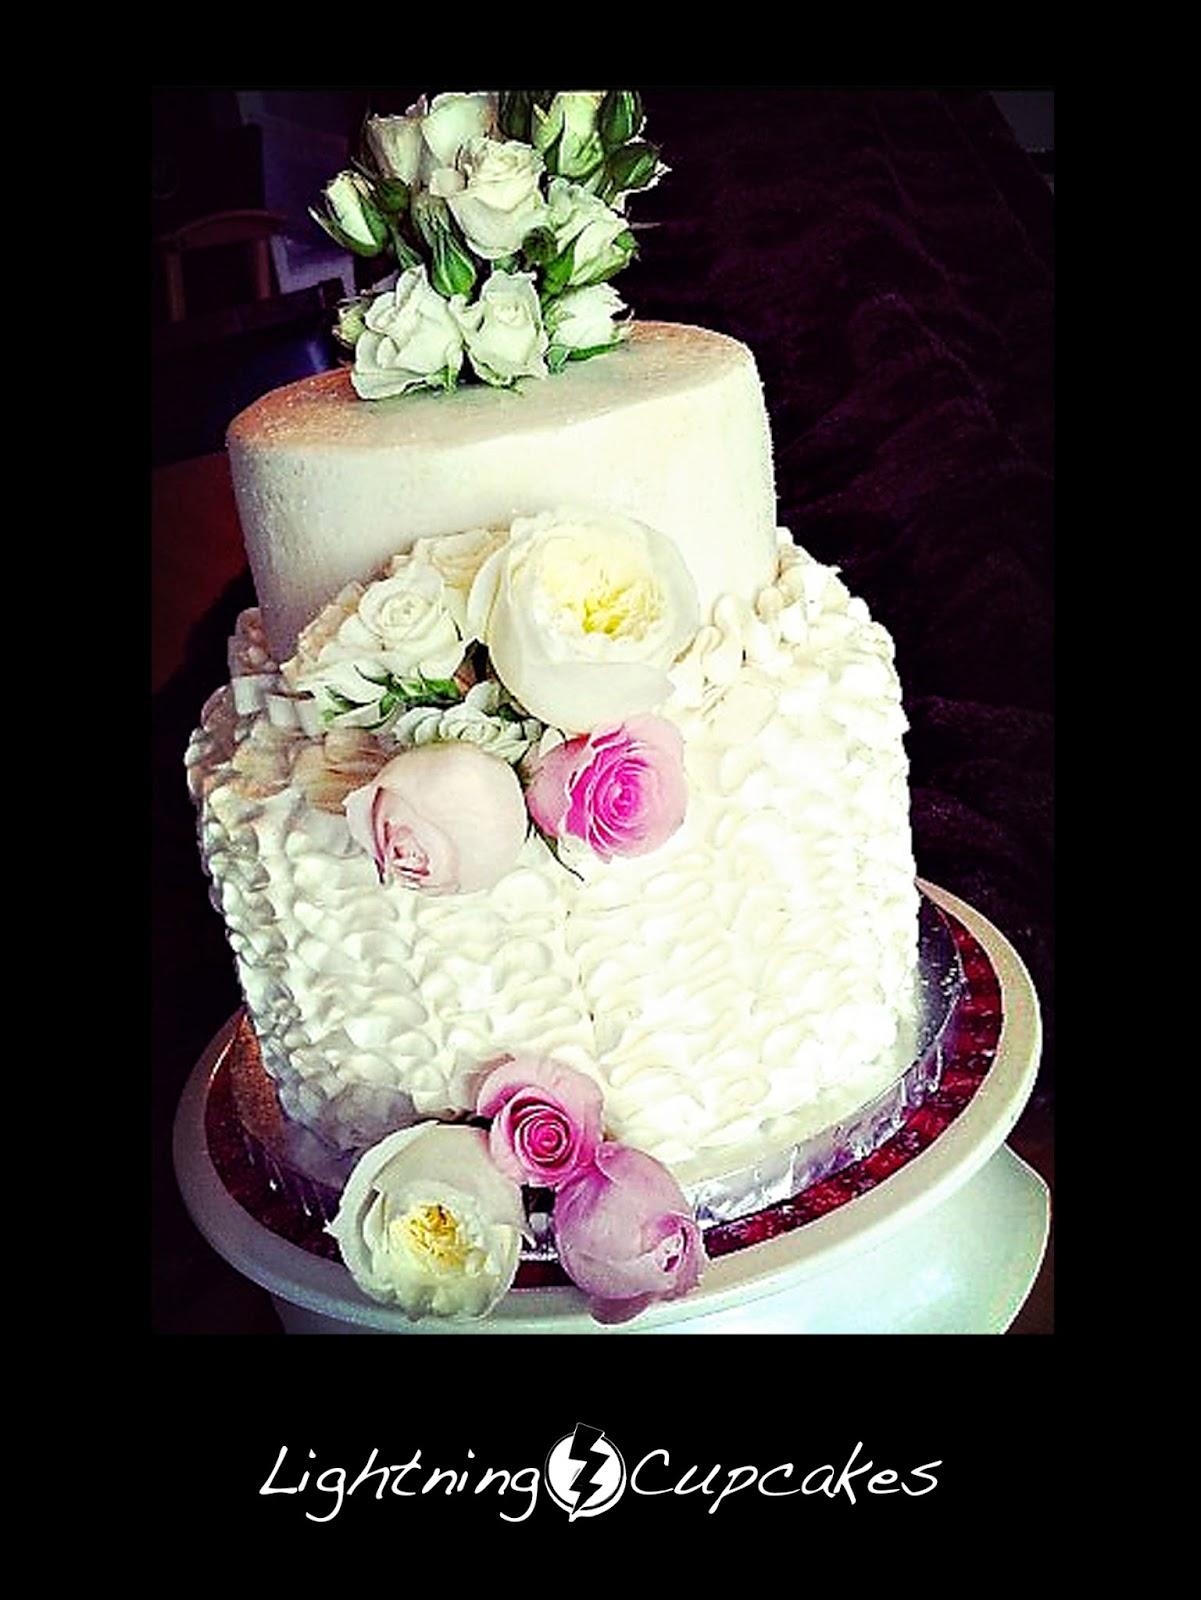 lightning cupcakes weddings events. Black Bedroom Furniture Sets. Home Design Ideas